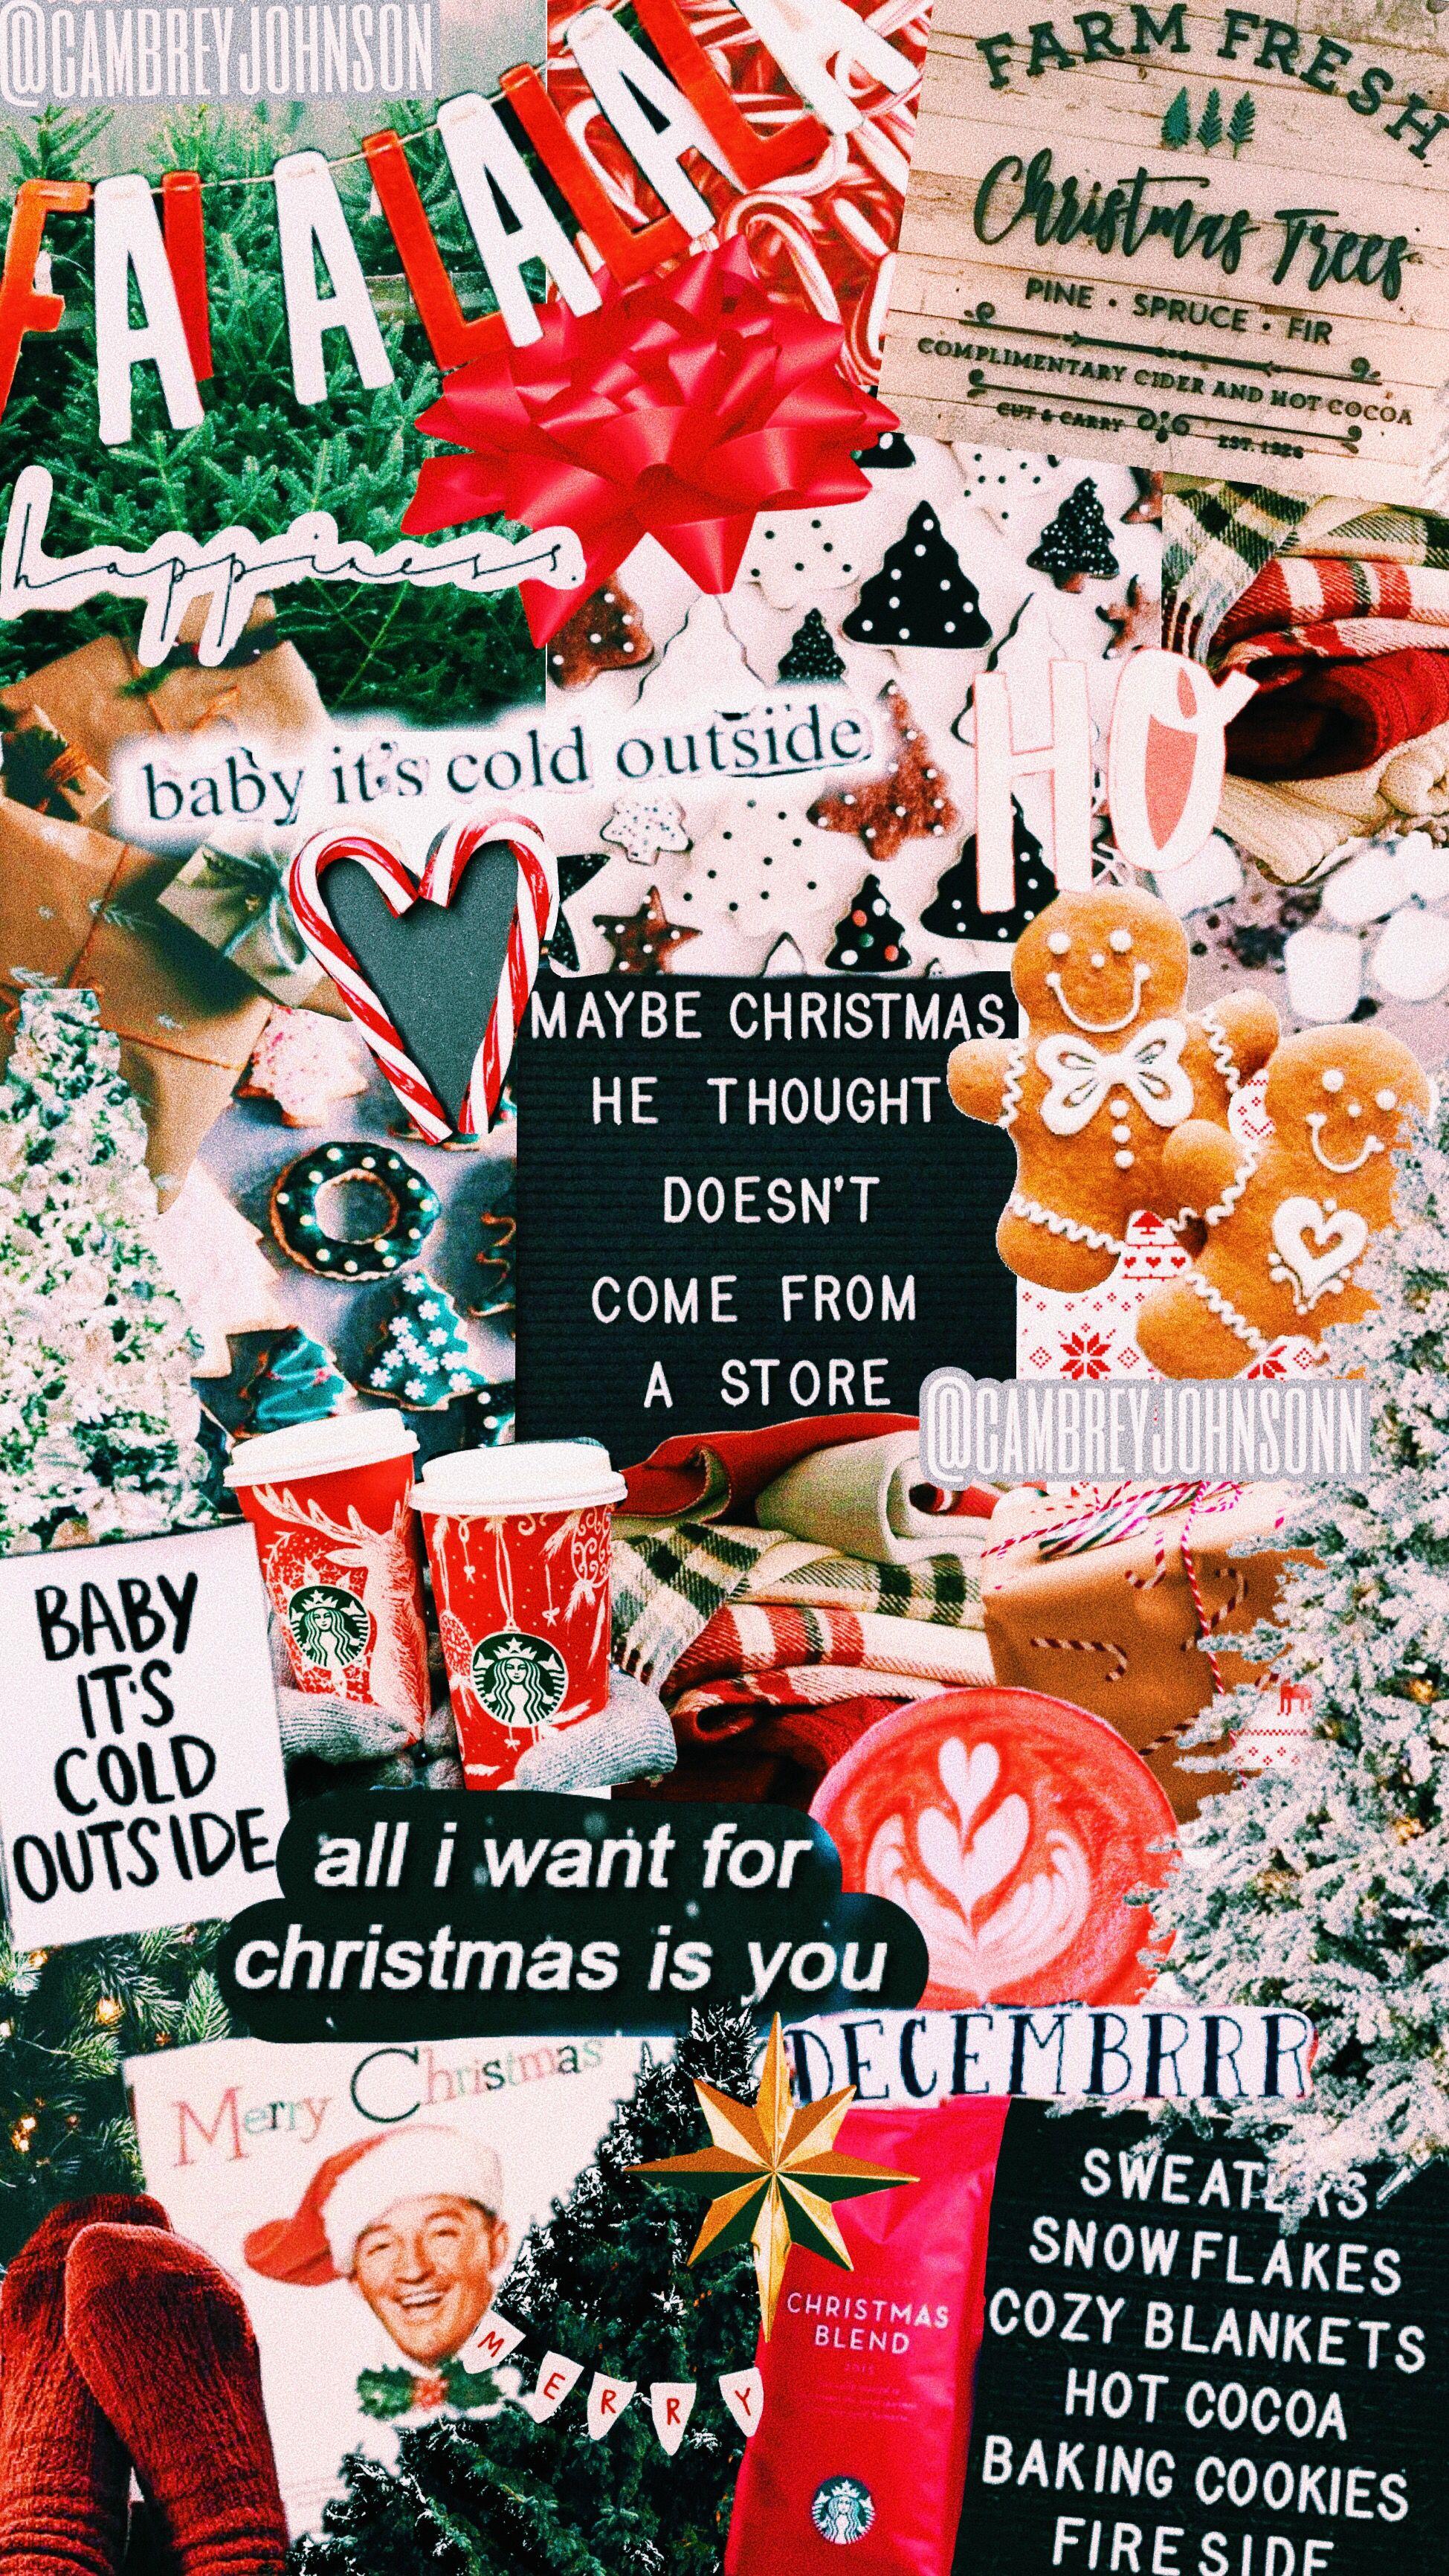 Ig Vsco Cambreyjohnson Christmas Phone Wallpaper Wallpaper Iphone Christmas Cute Christmas Wallpaper